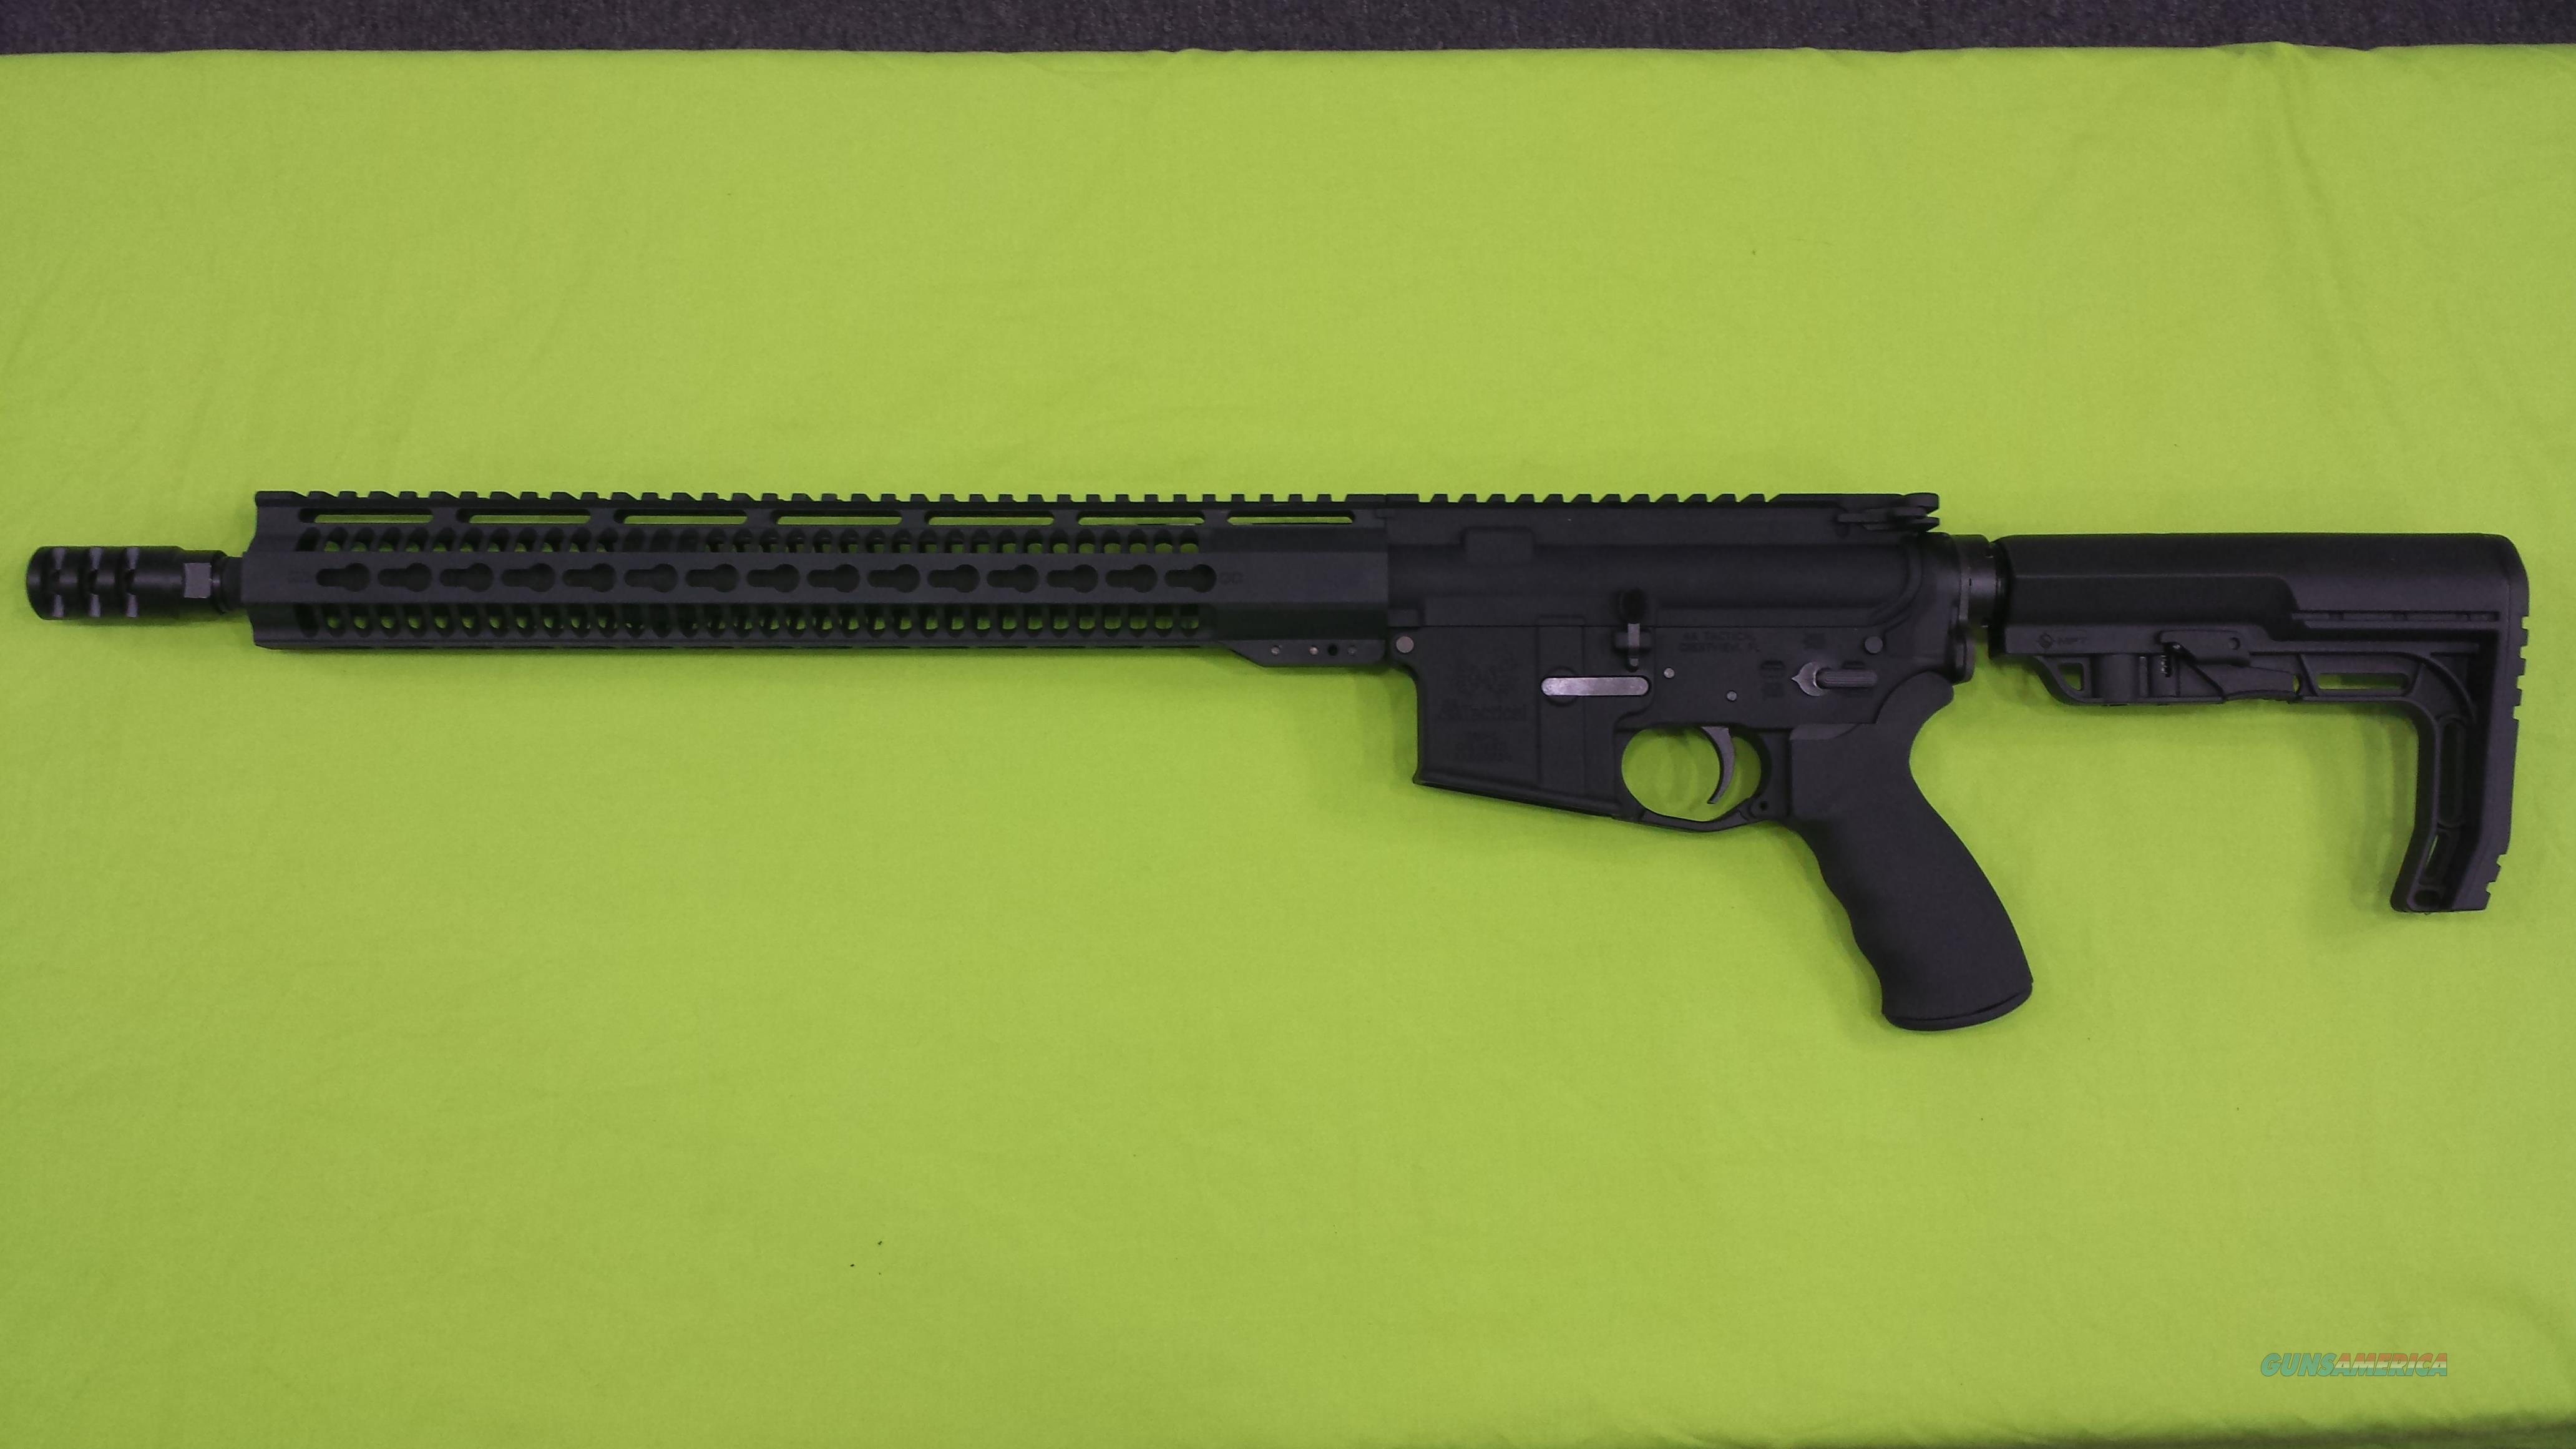 AA TACTICAL TAC-L 300BLK 300 AAC MFT MINIMALIST BLACK AR15  Guns > Rifles > AR-15 Rifles - Small Manufacturers > Complete Rifle